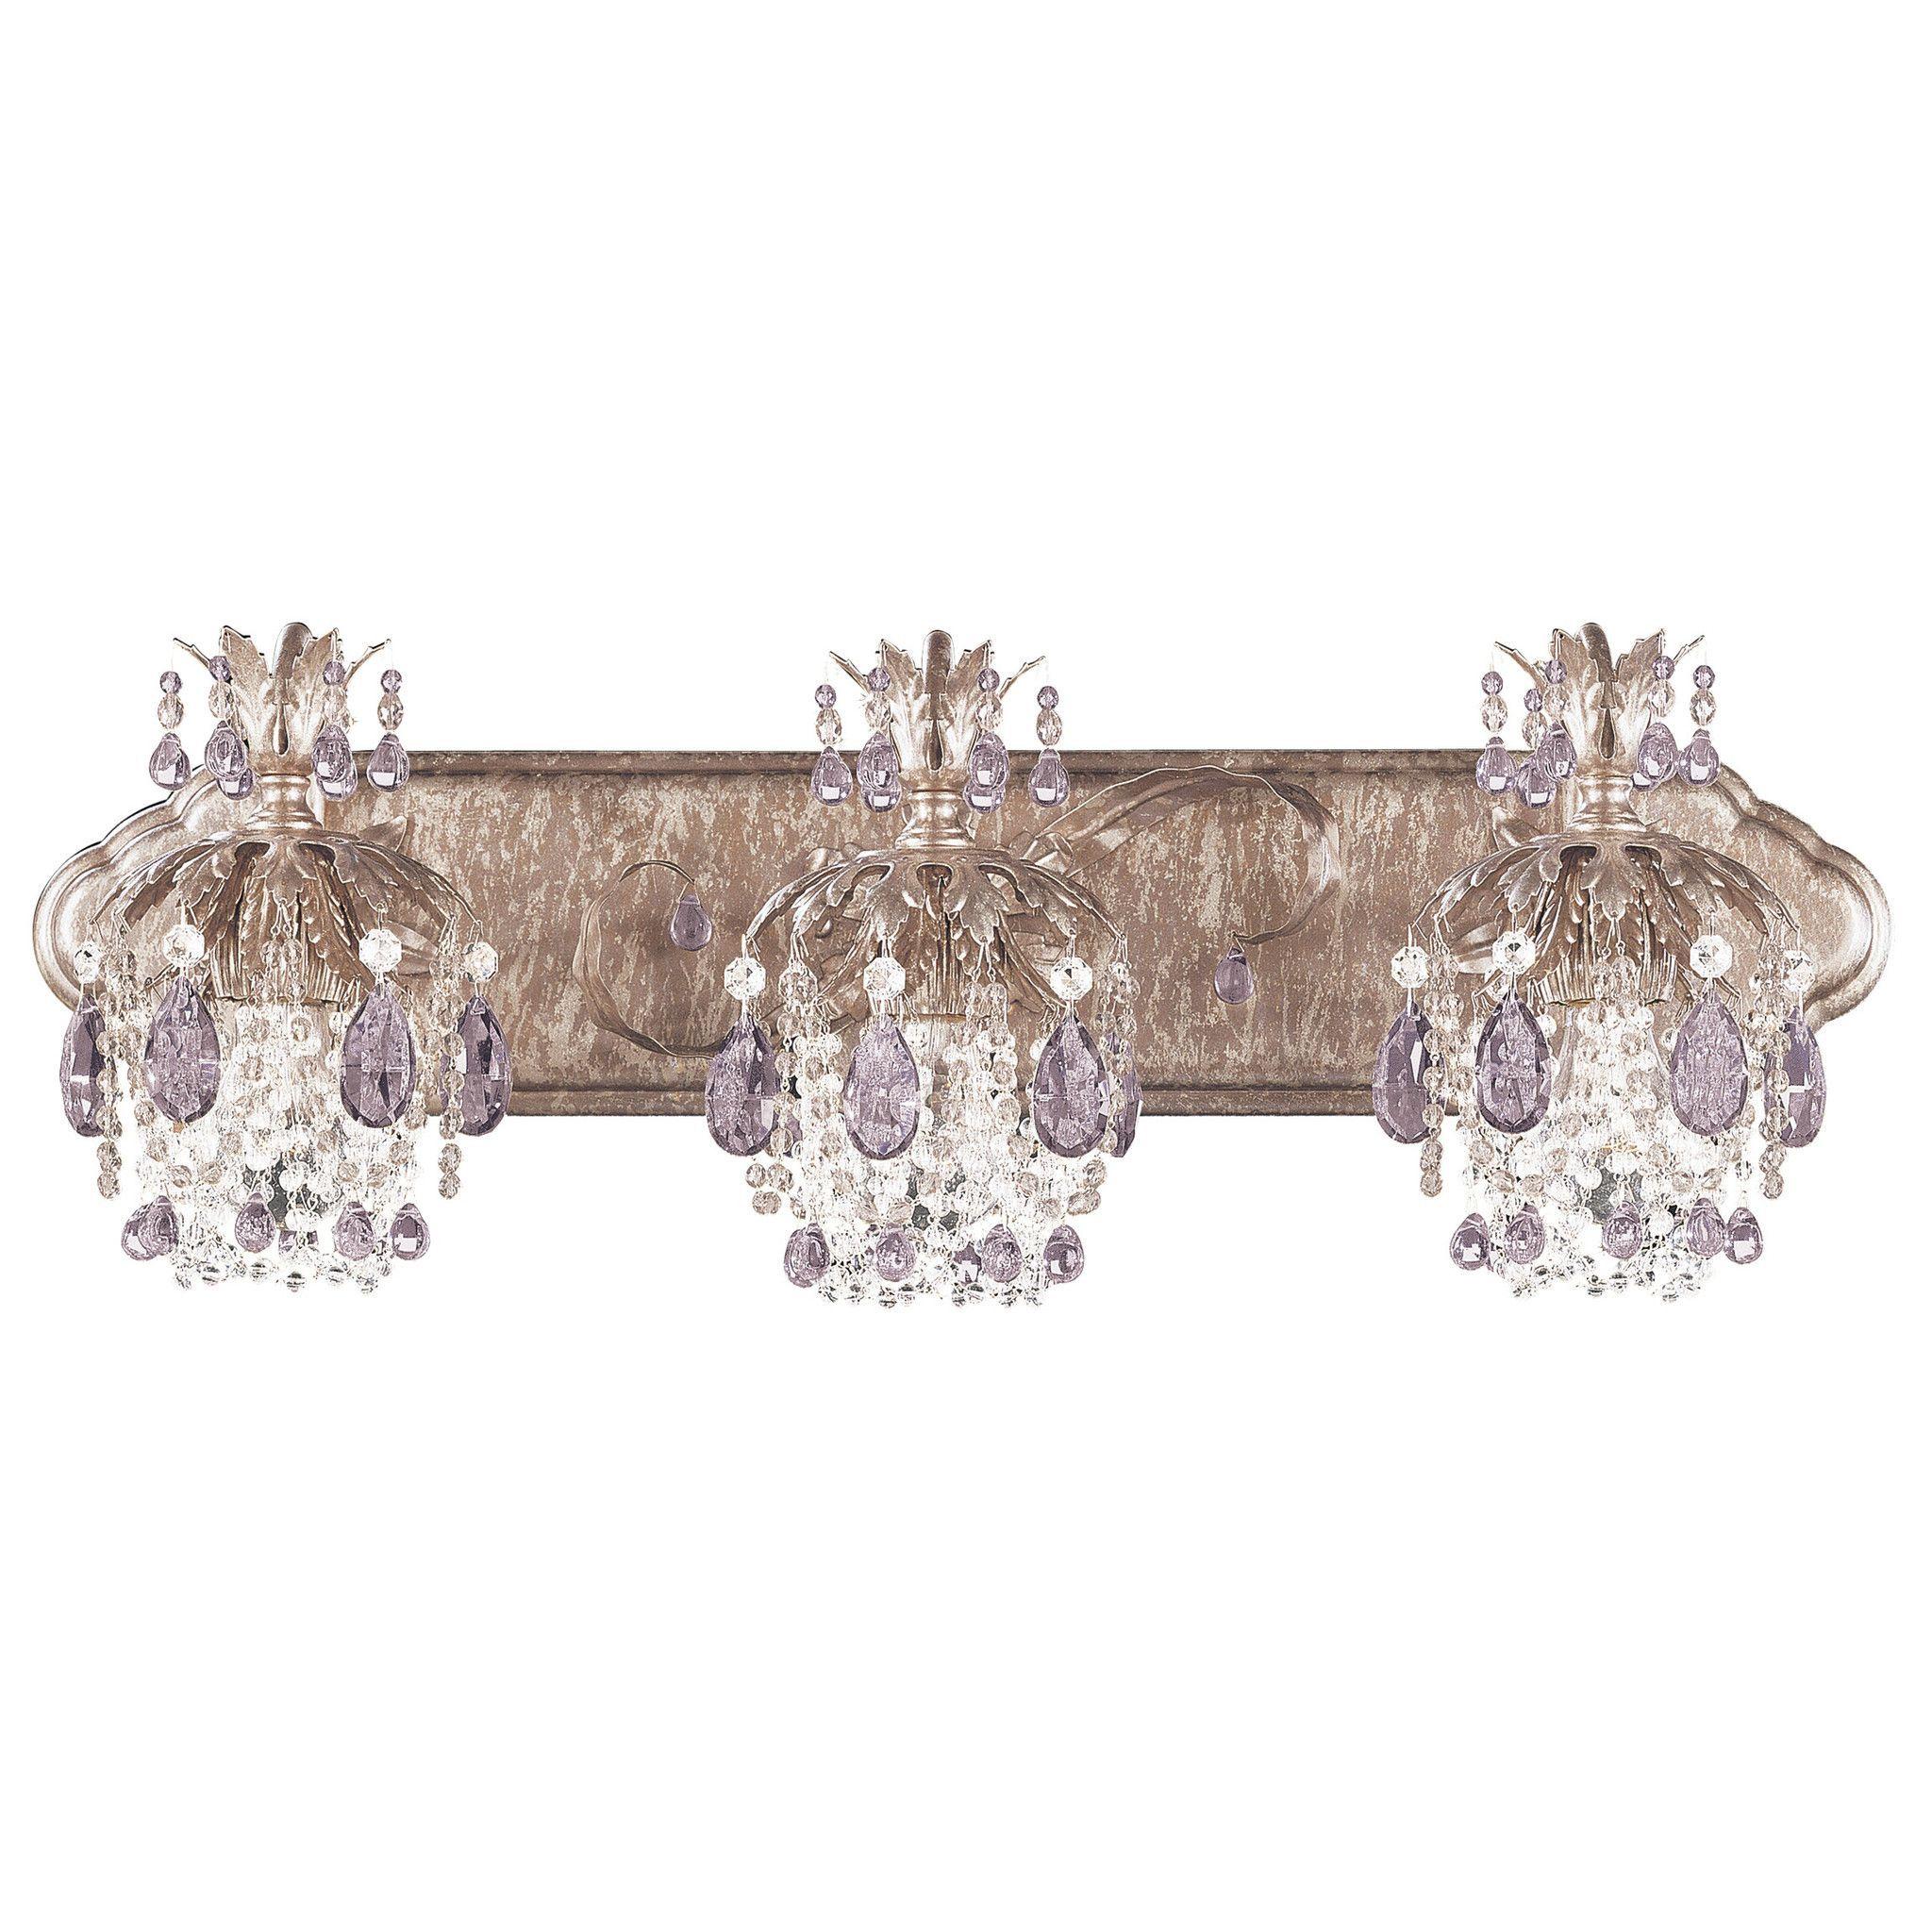 Schonbek 1256 Rondelle 8 Inch Bath Vanity Light Crystal Bathroom